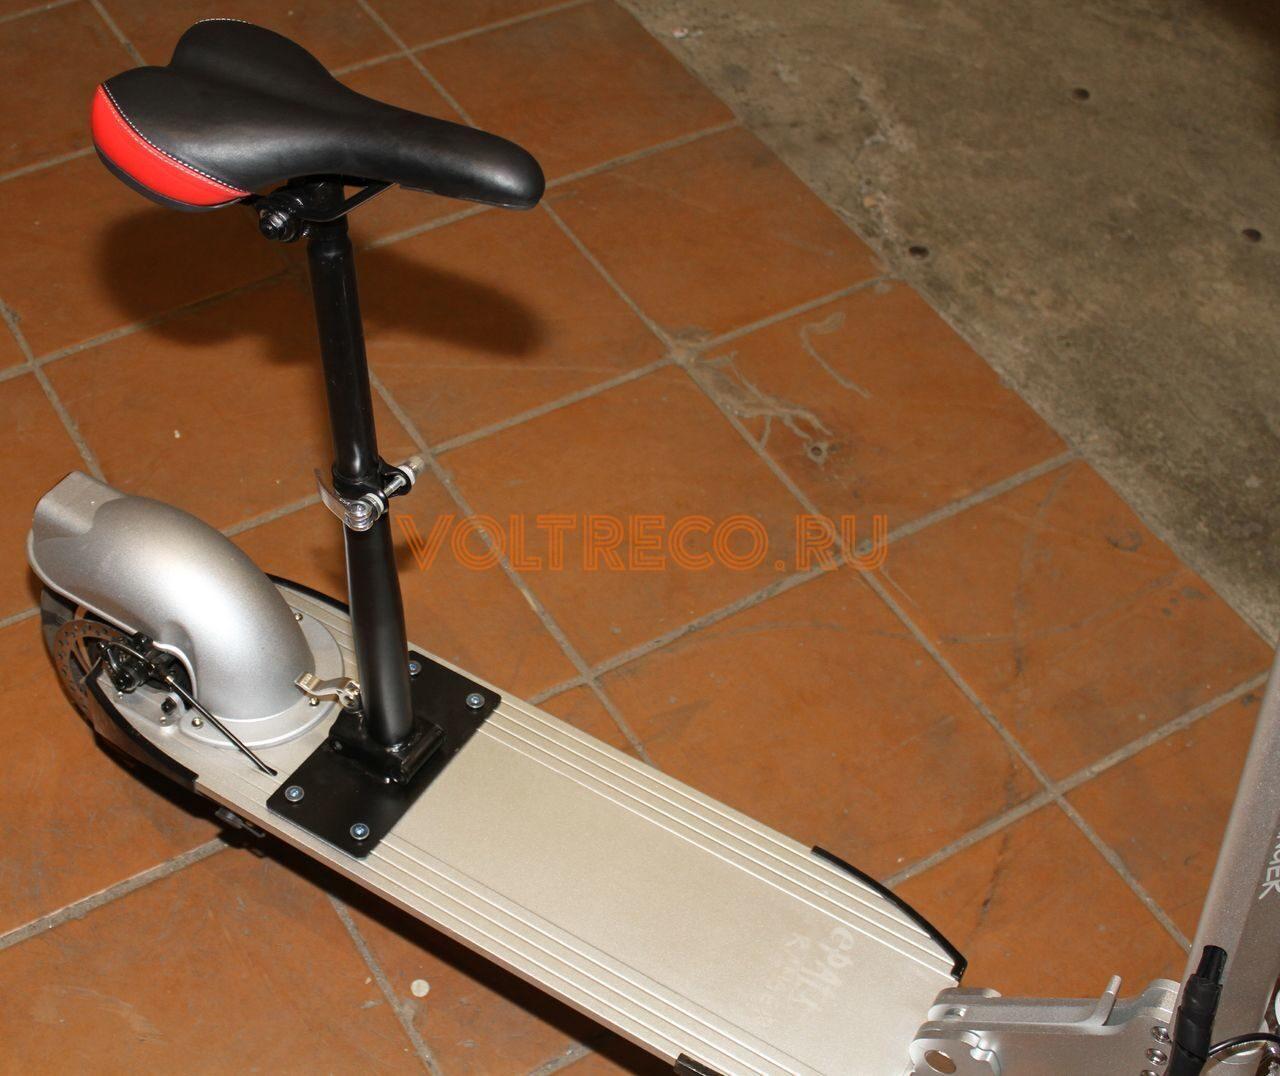 электросамокат volteco pat ranger comfort 1000w 48v